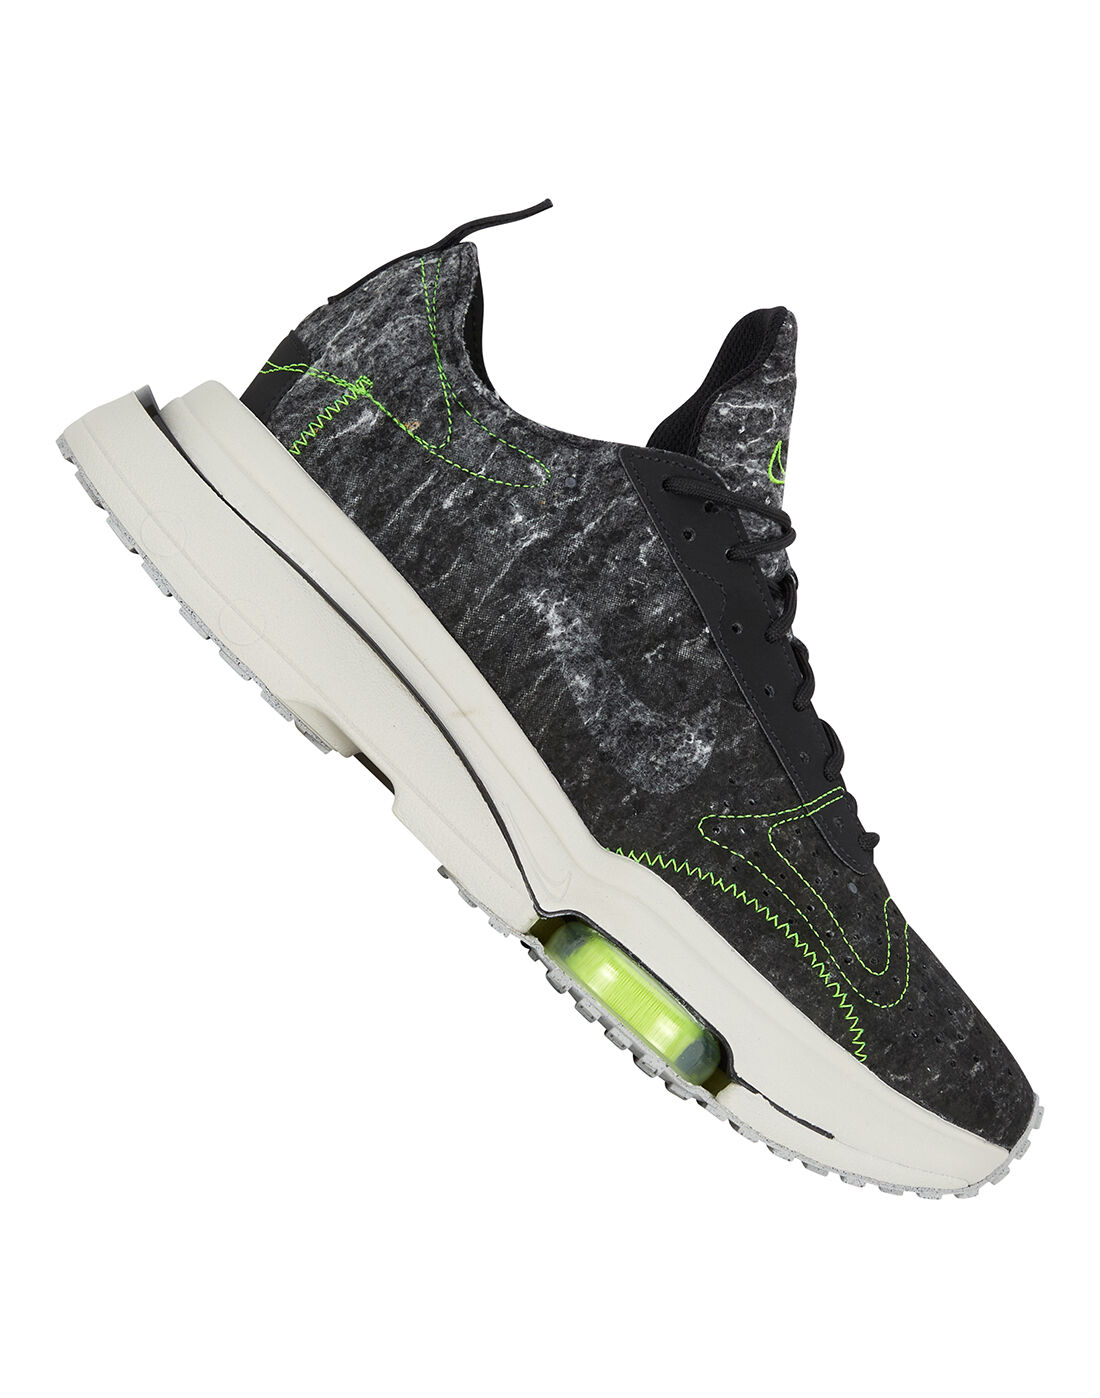 Nike nike huarache uk shops for women sale online | Mens Air Zoom Type